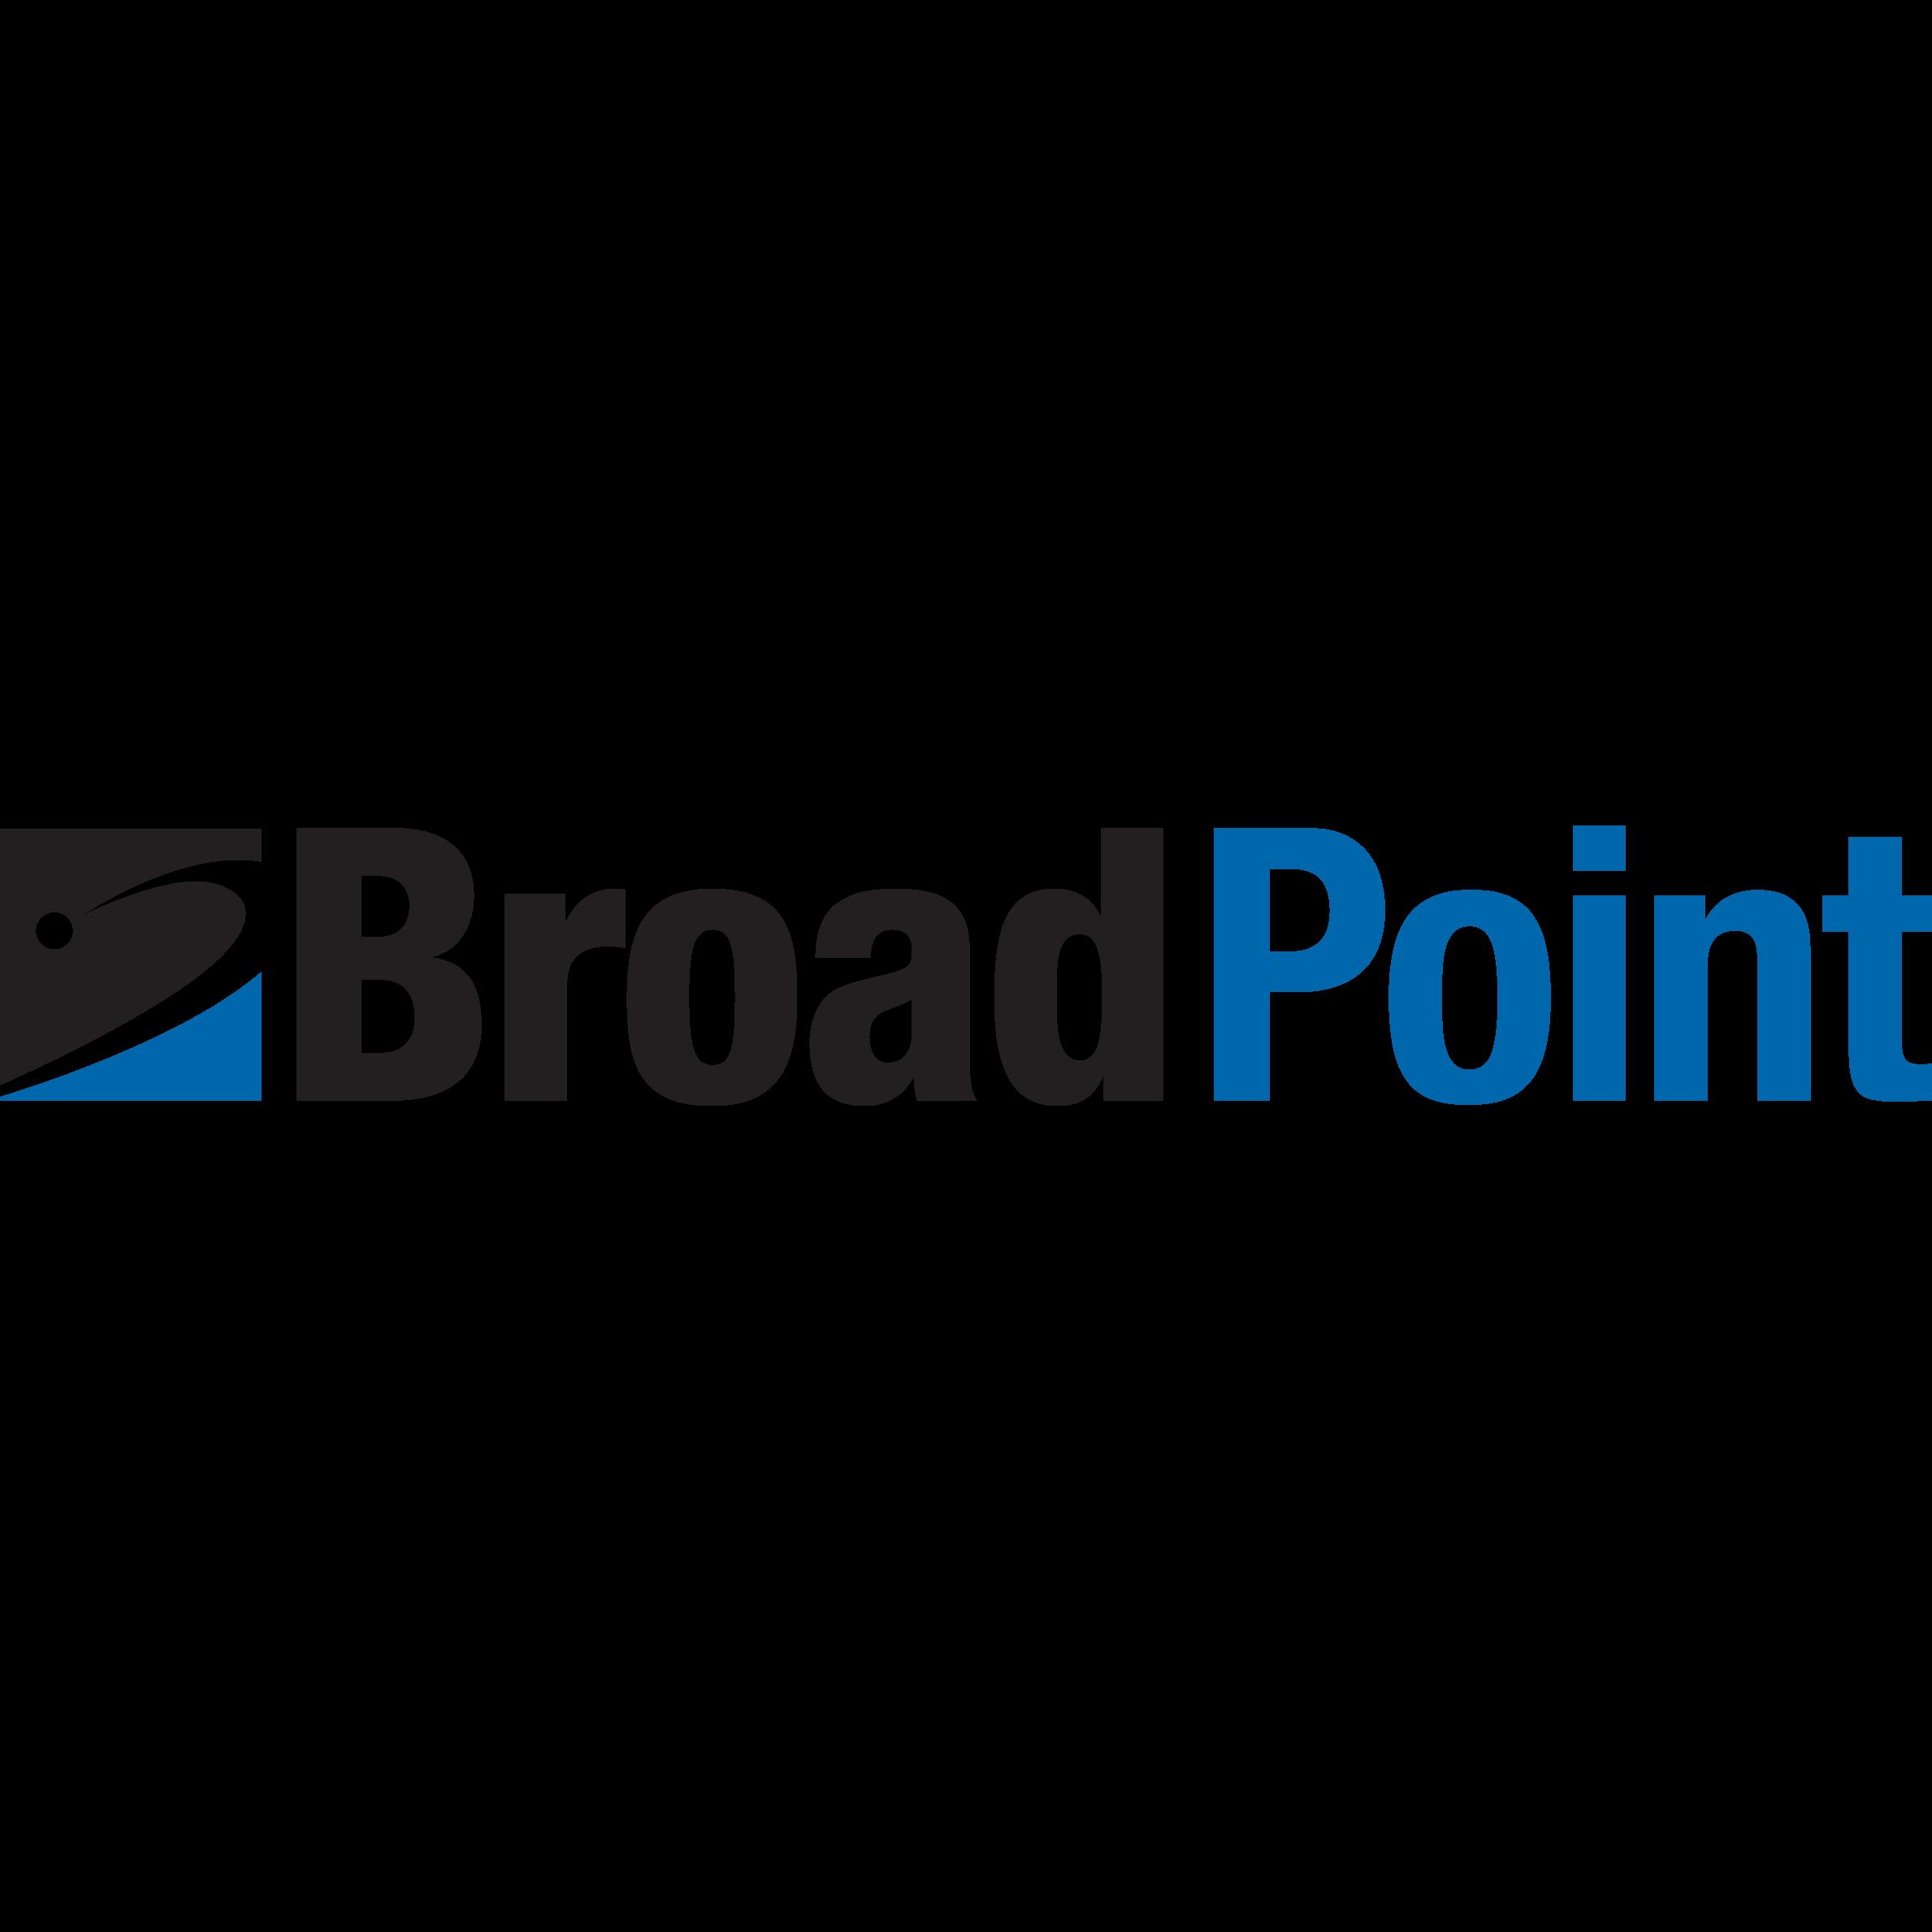 BroadPoint, Inc.